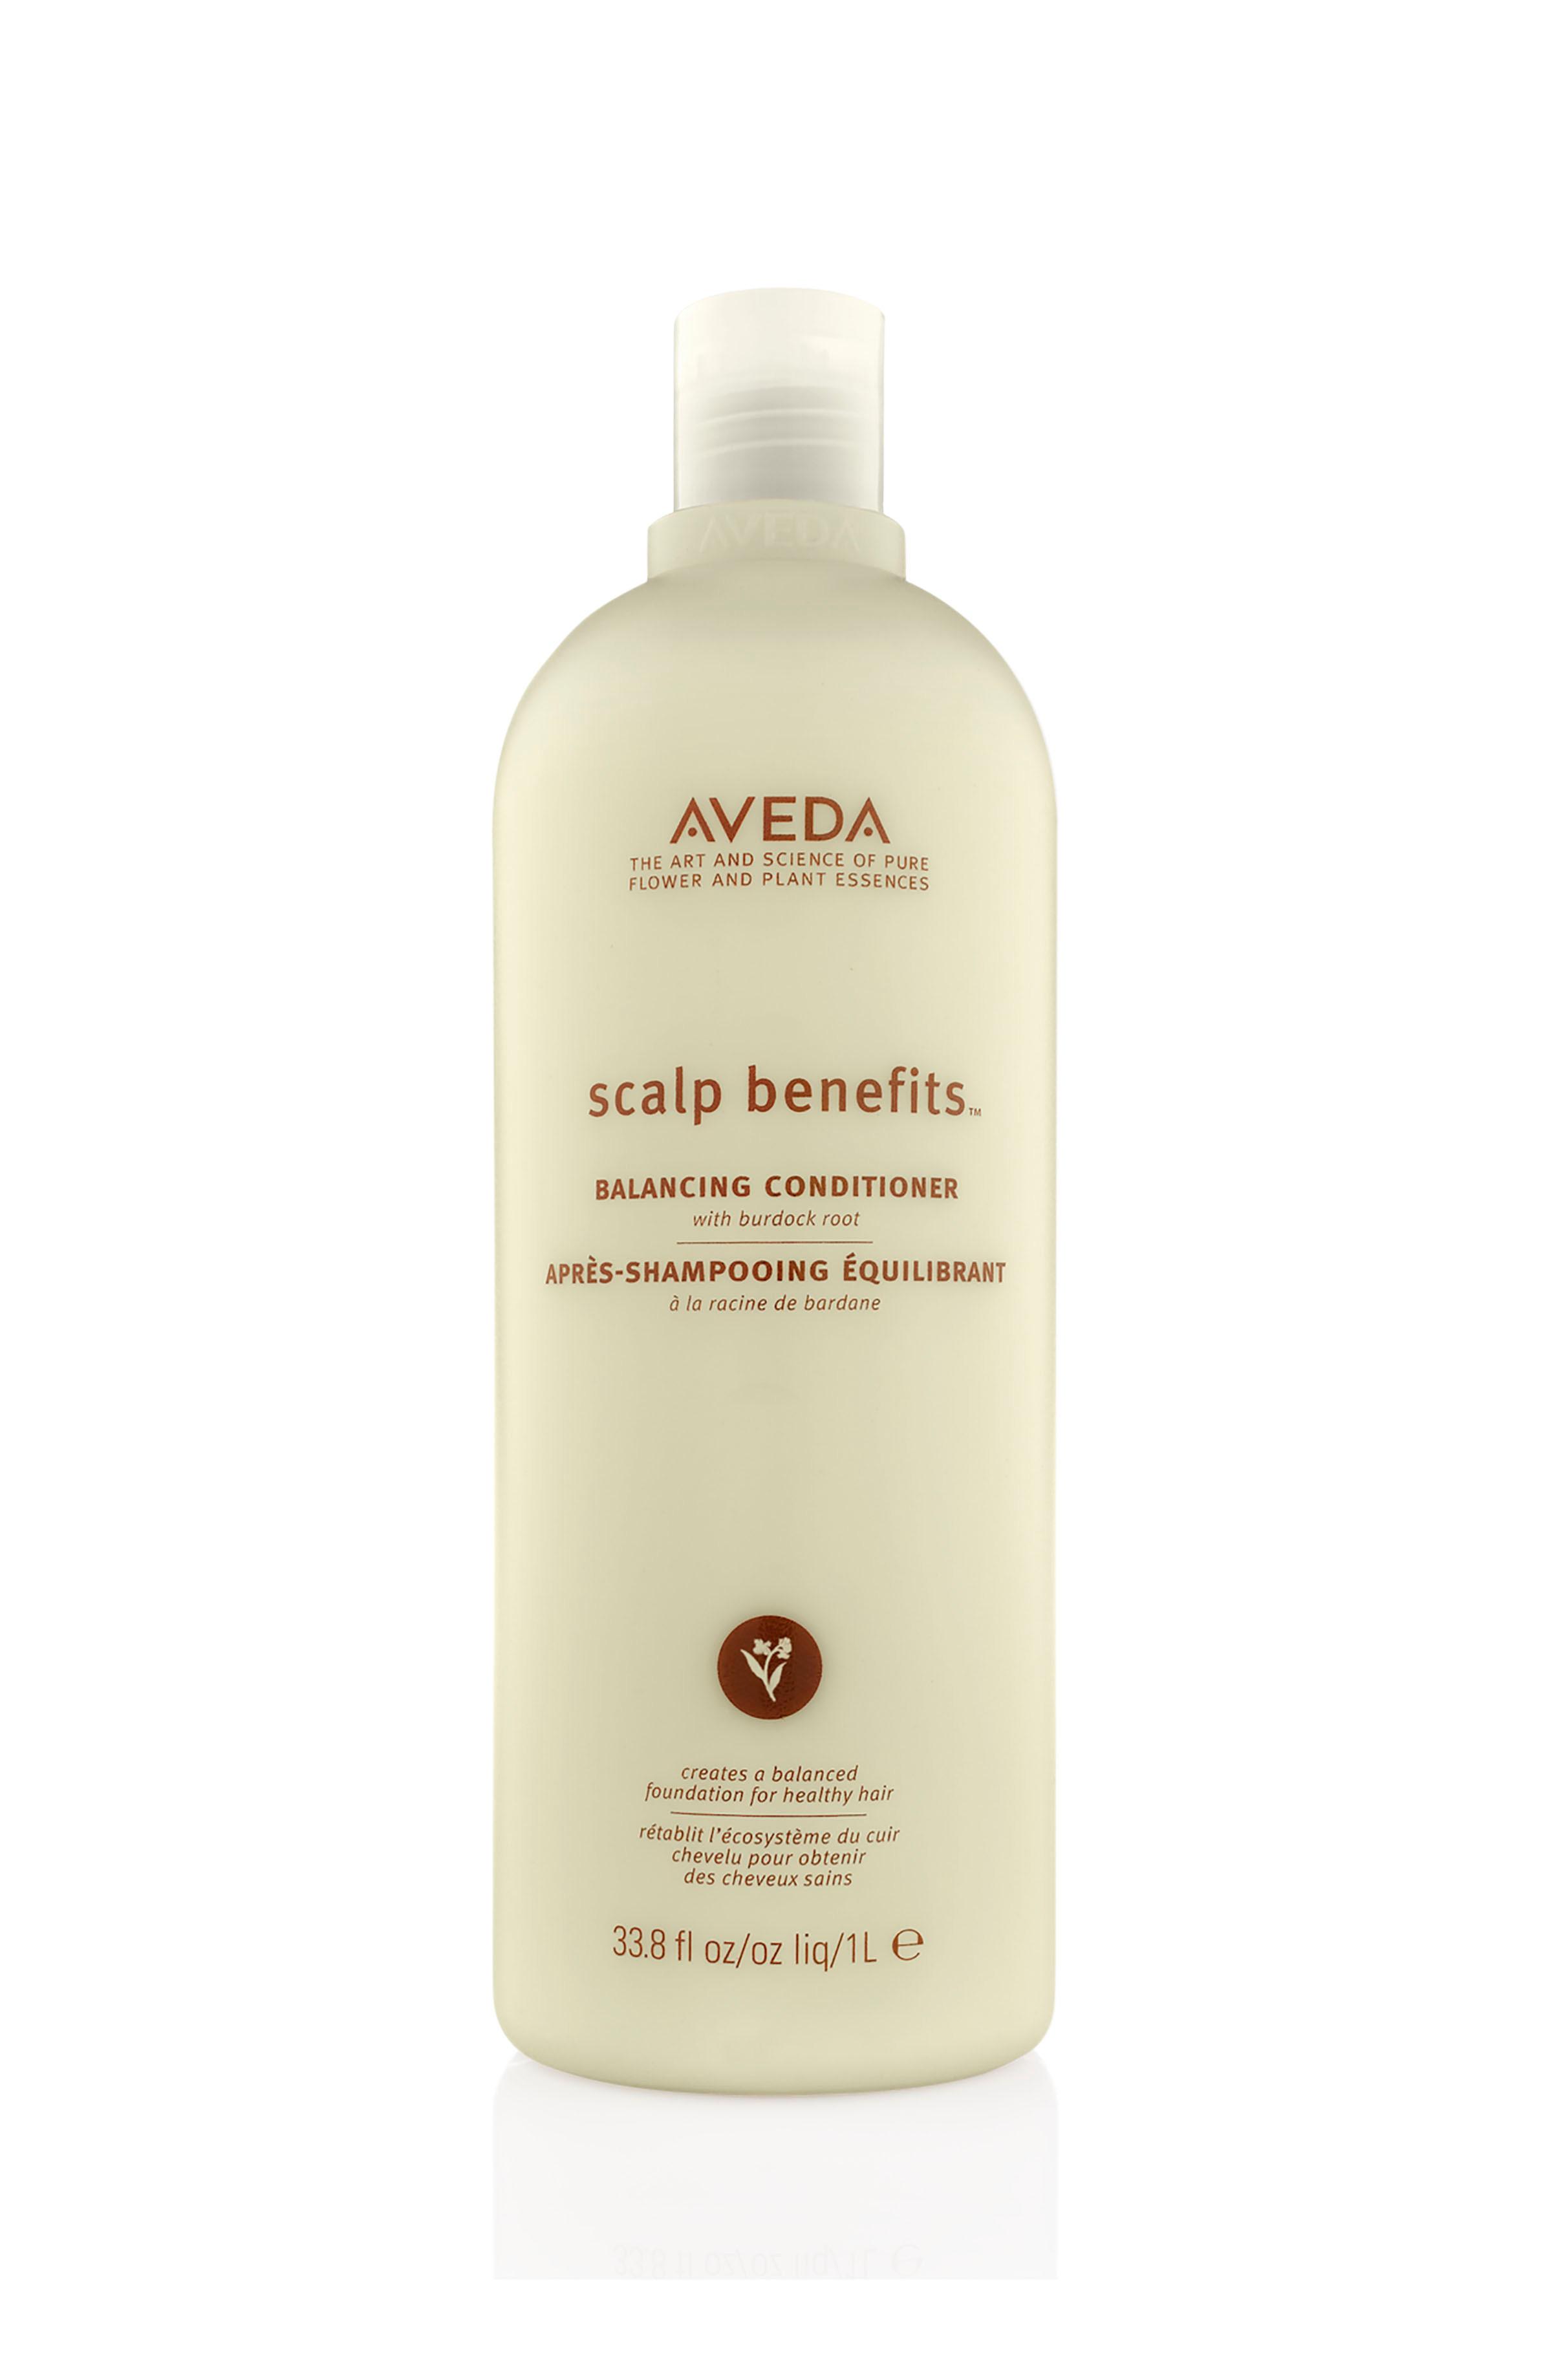 Aveda scalp benefits balsamo riequilibrante 1000 ml, Beige, large image number 0